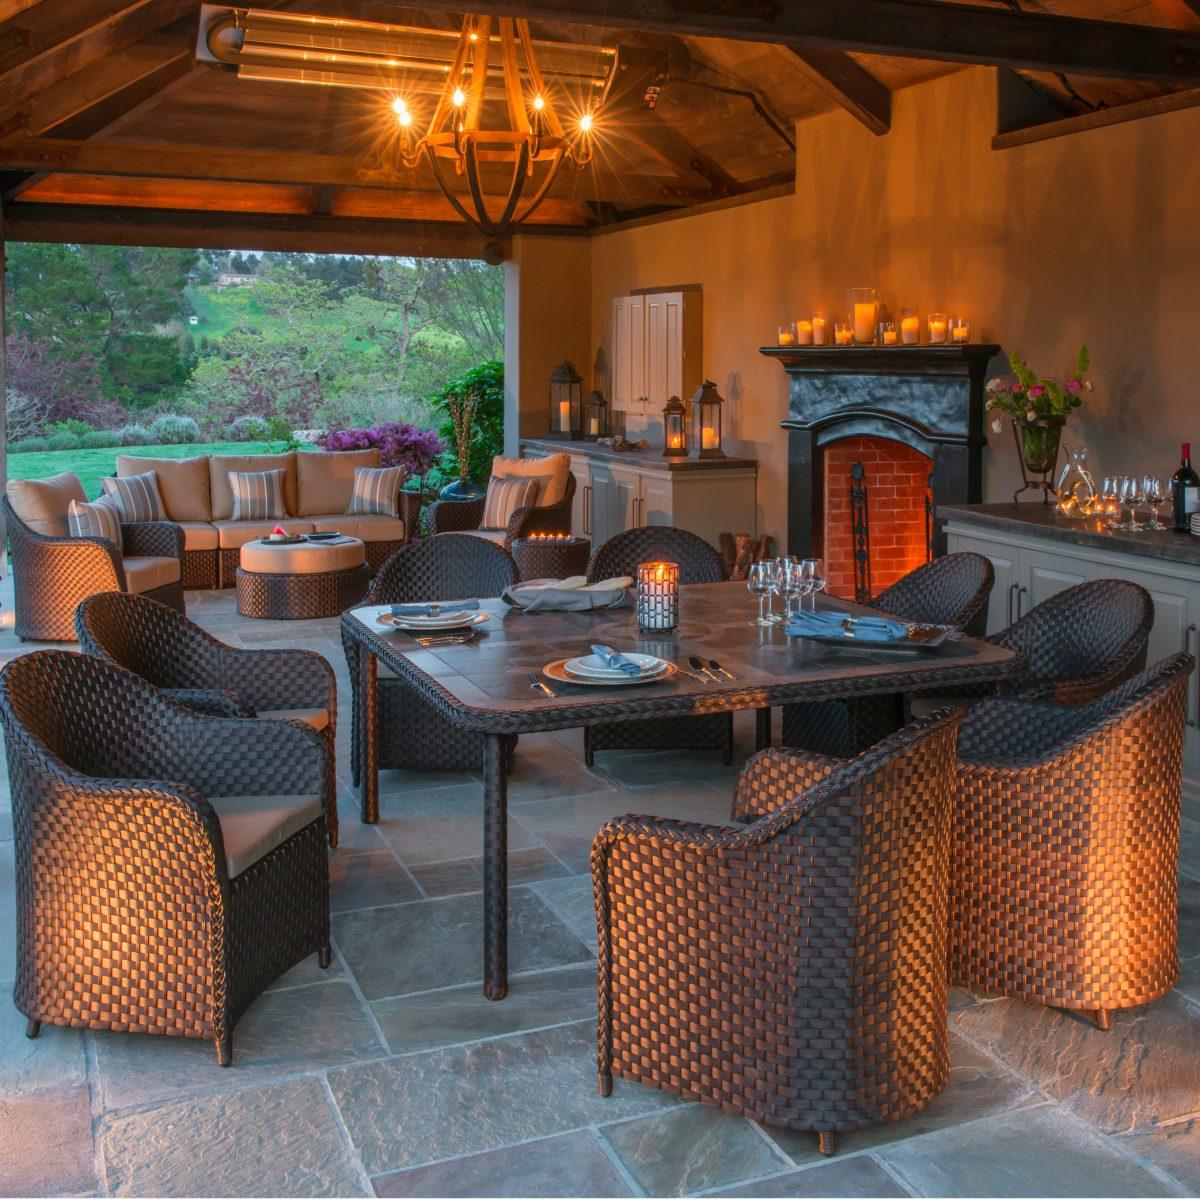 Top 5 Outdoor Entertainment Ideas For Your Backyard | Starsong on Small Backyard Entertainment Area Ideas id=11940